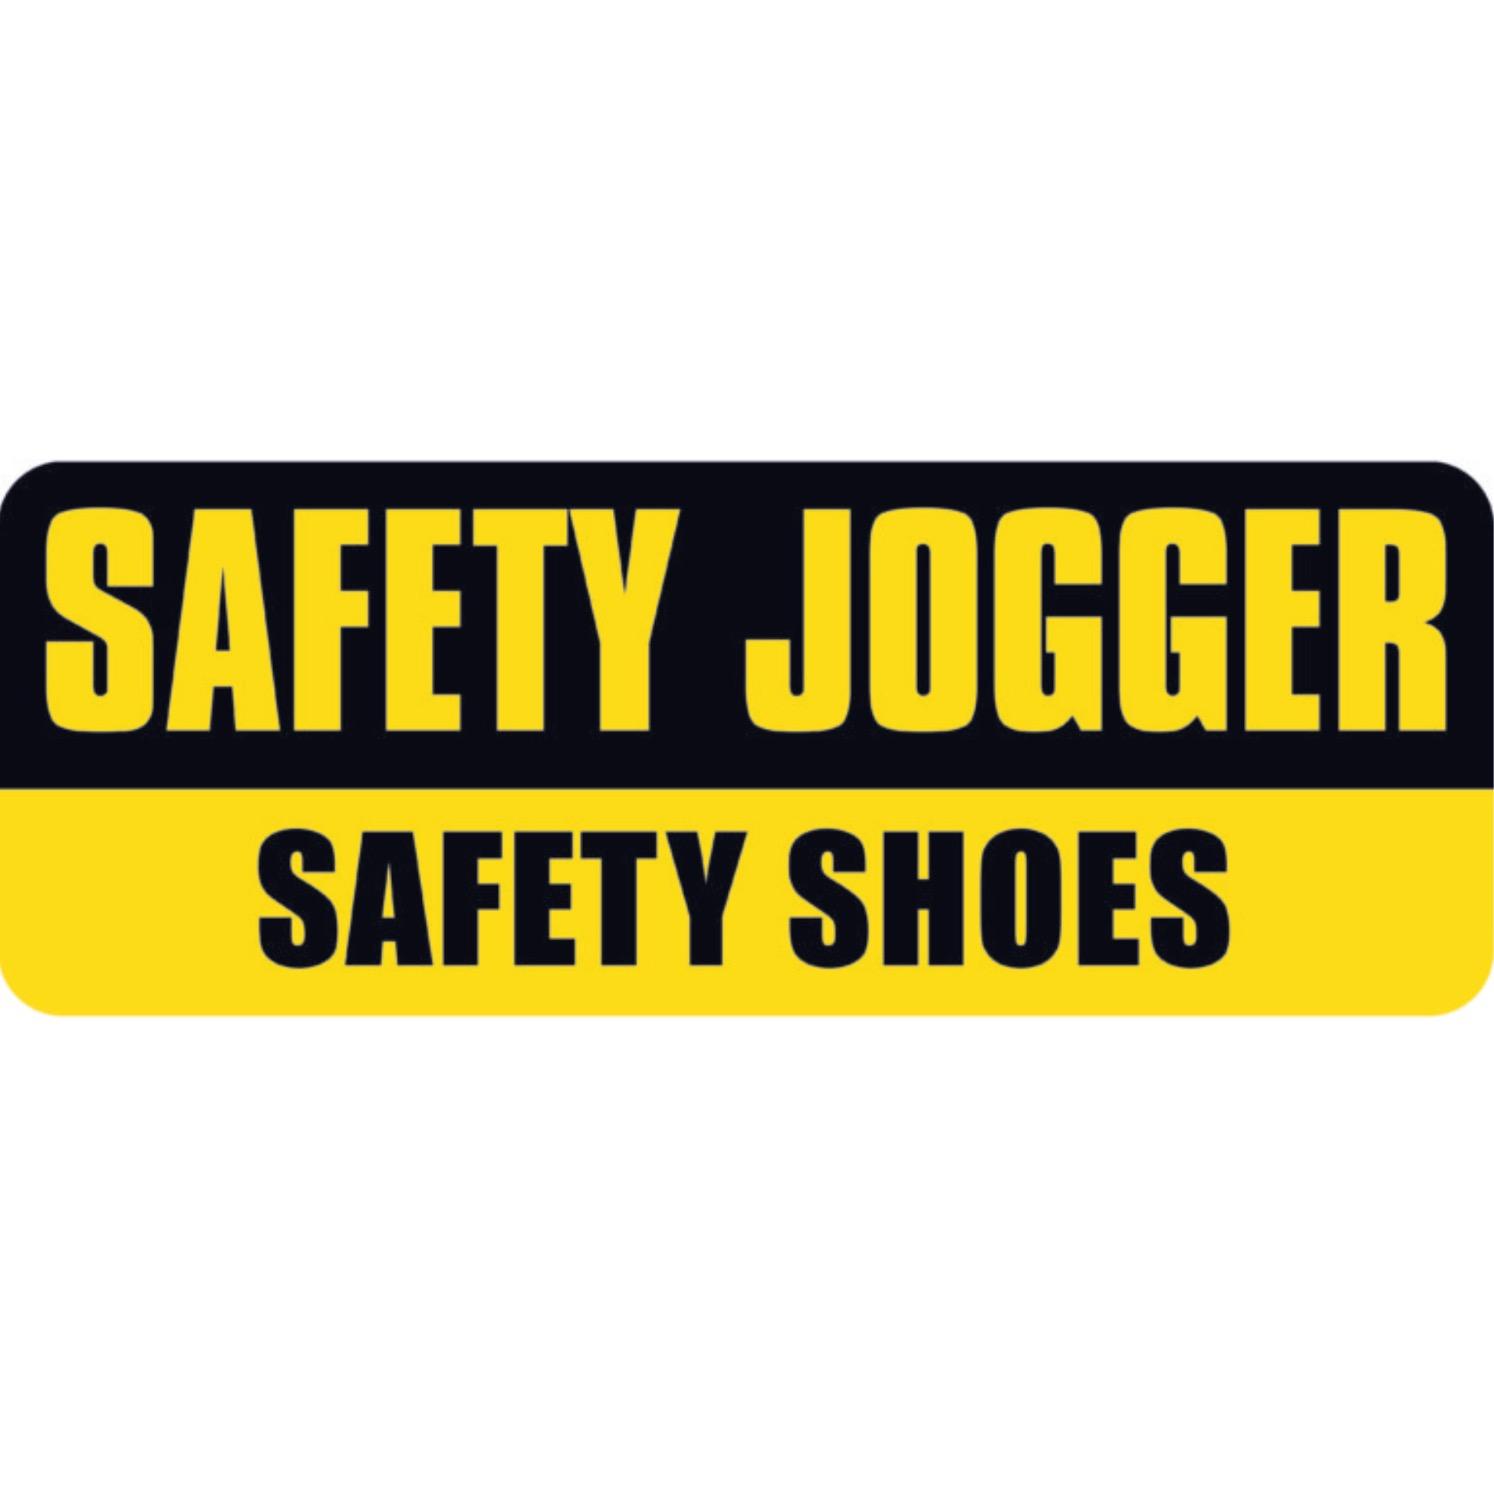 Safetyjogger-logo